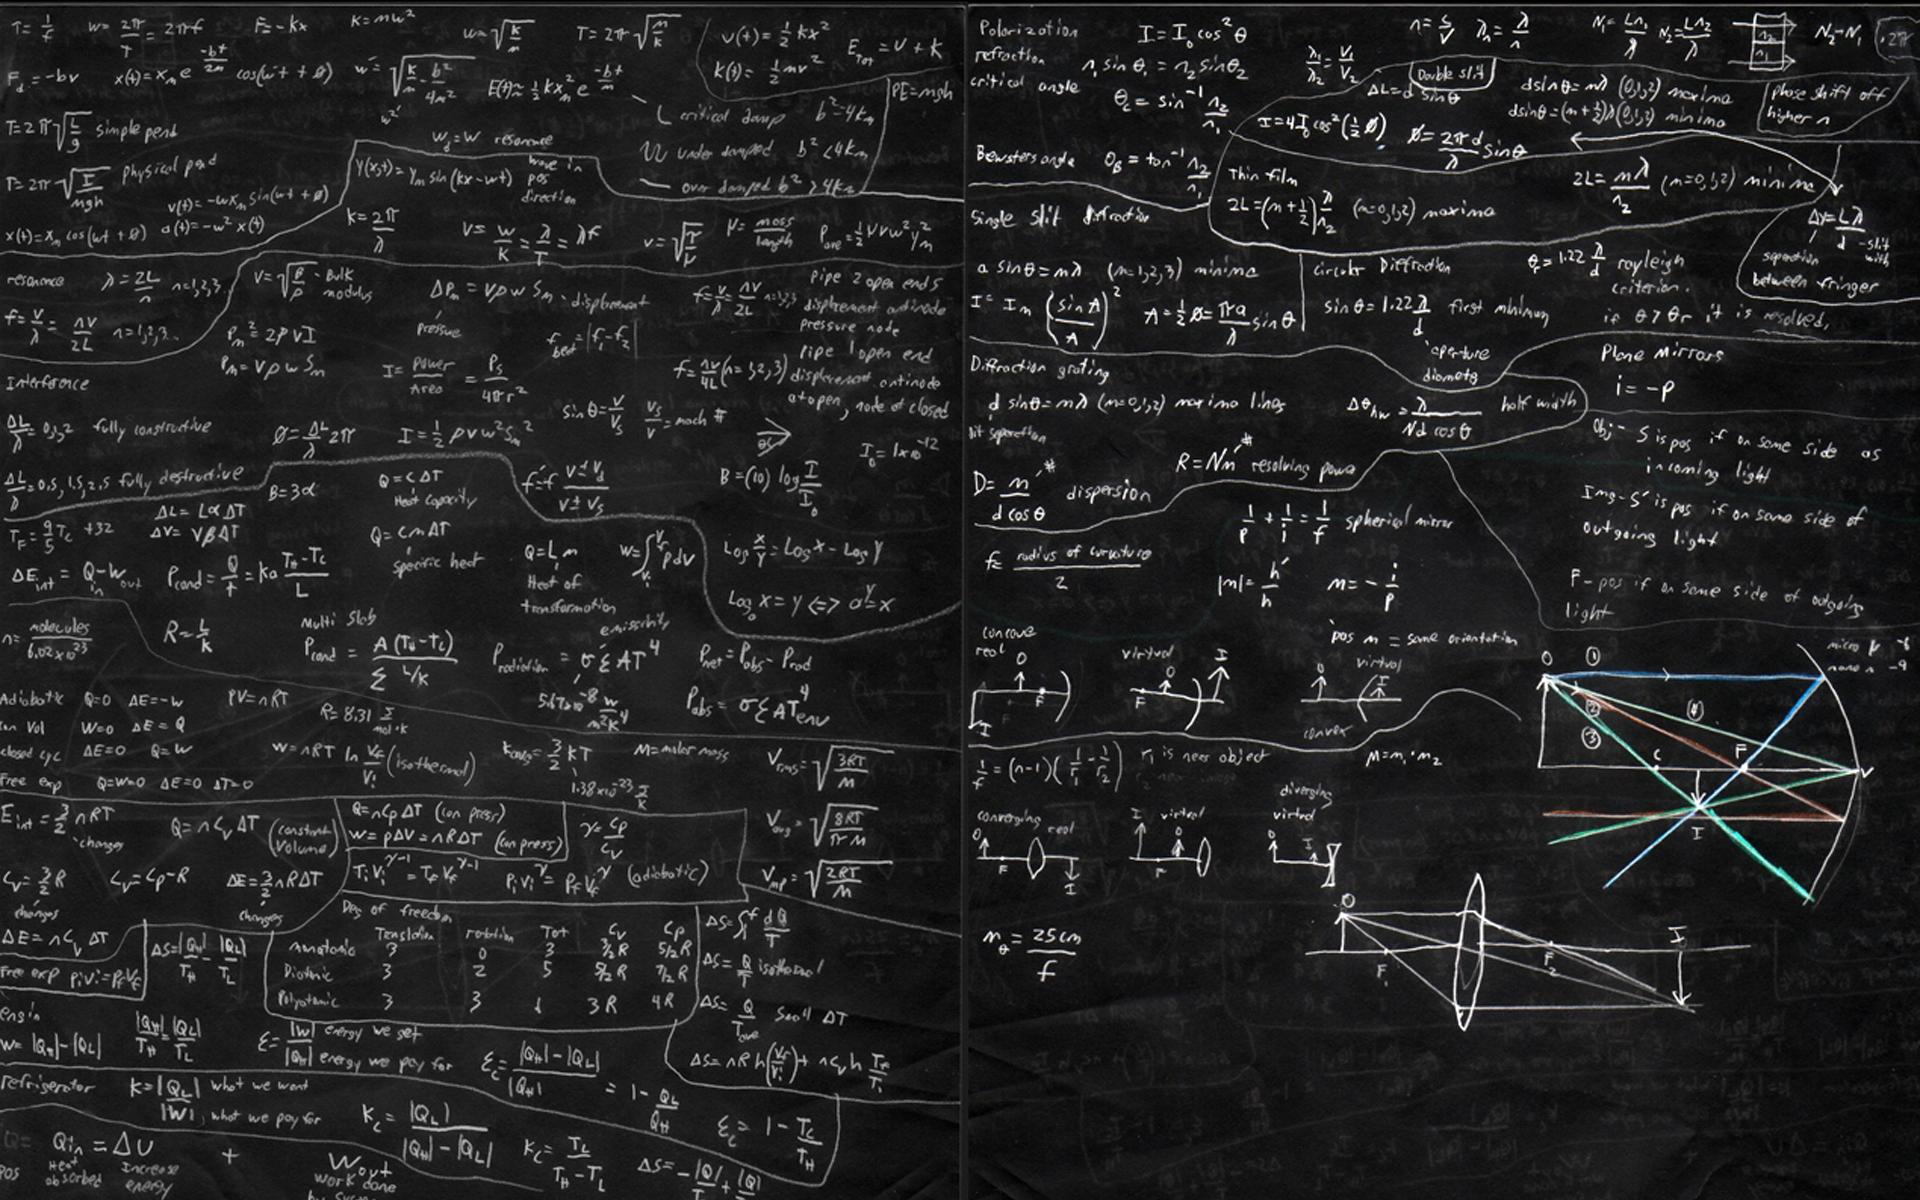 Обои на телефон формулы по физике